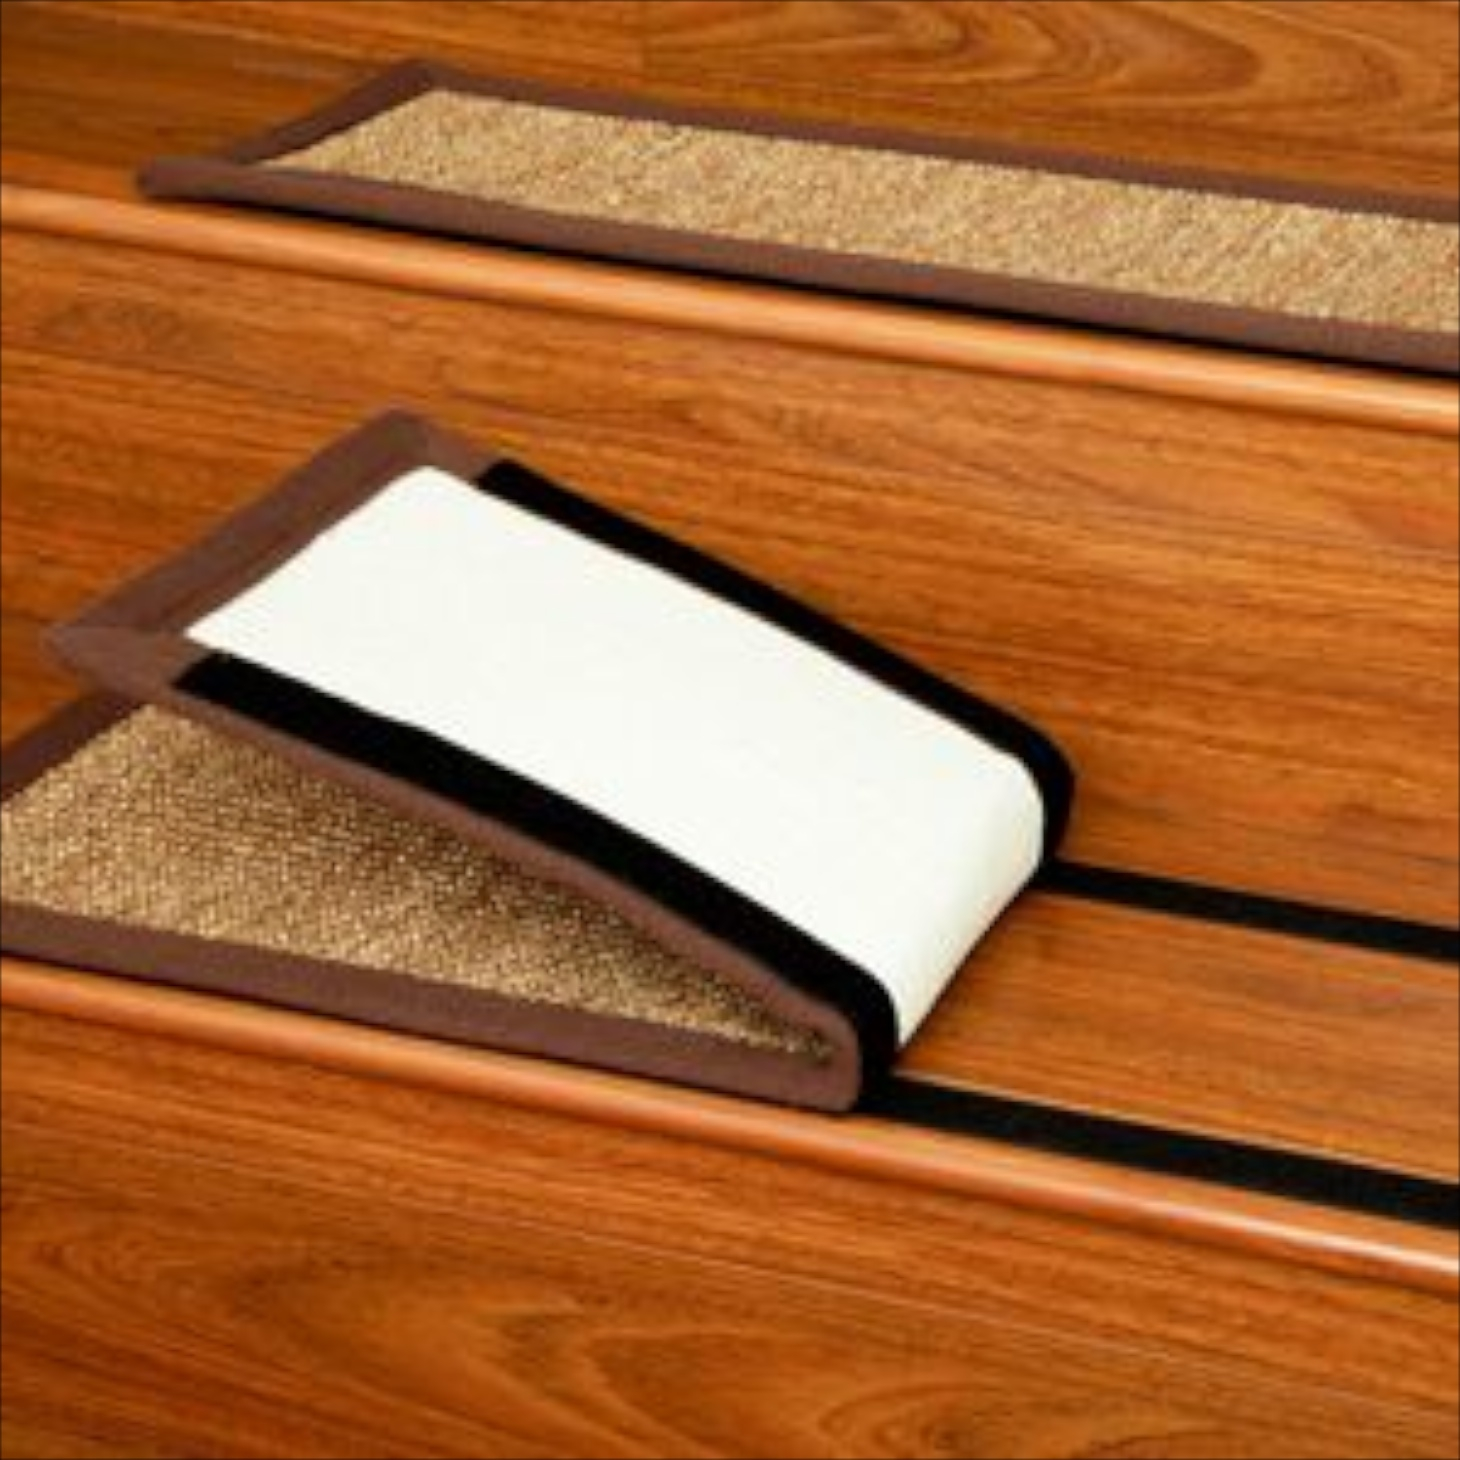 Flooring Stair Treads Carpet Carpet Tread Carpet Treads For Intended For Carpet Stair Treads And Rugs (#9 of 20)